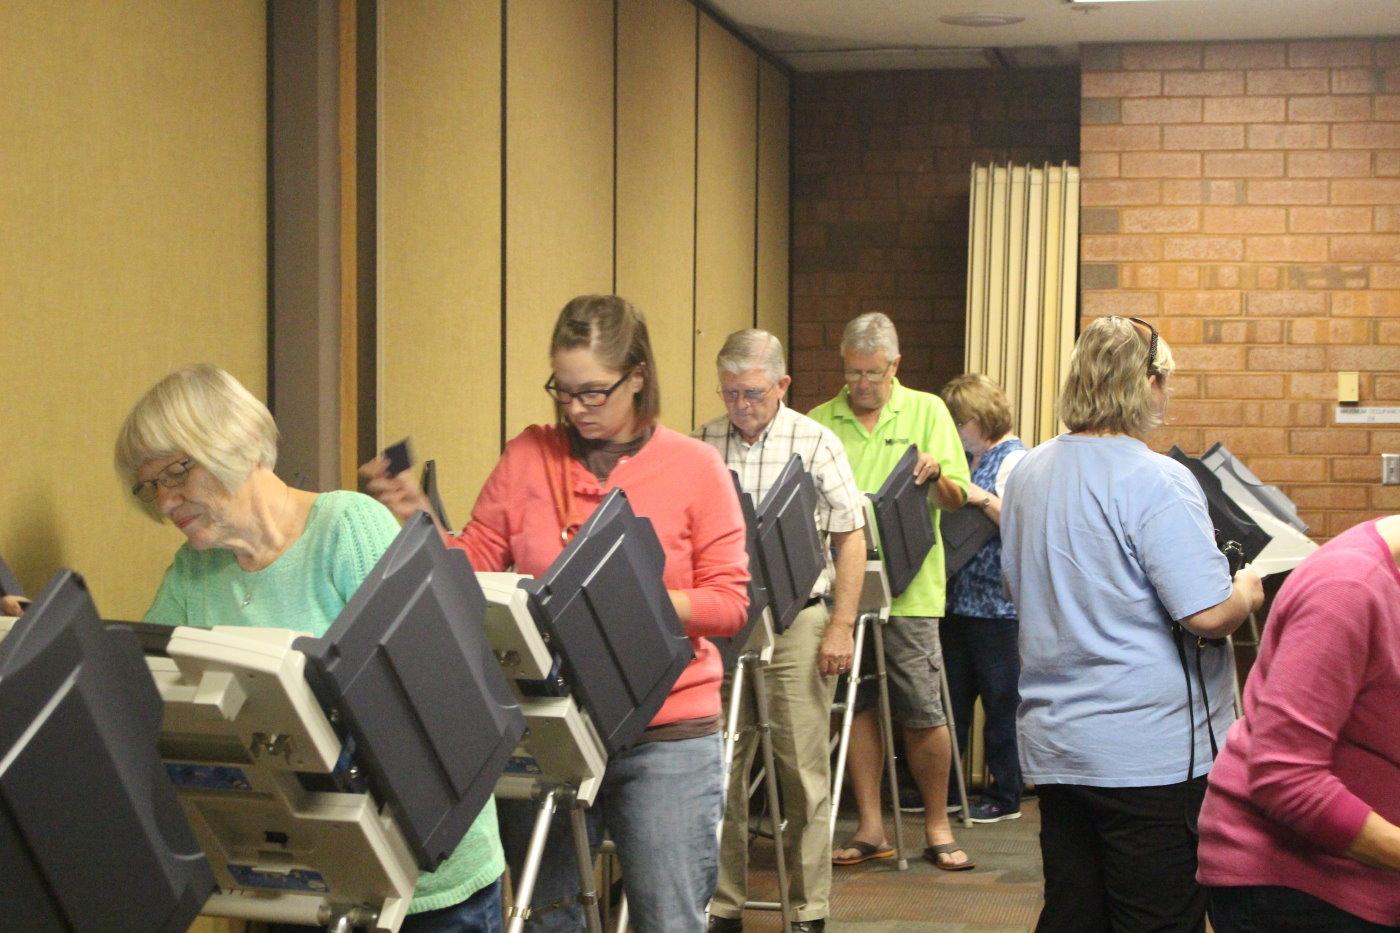 St. George residents voting early in the 2016 general election, St. George, Utah, Nov. 4, 2016   Photo by Mori Kessler, St. George News